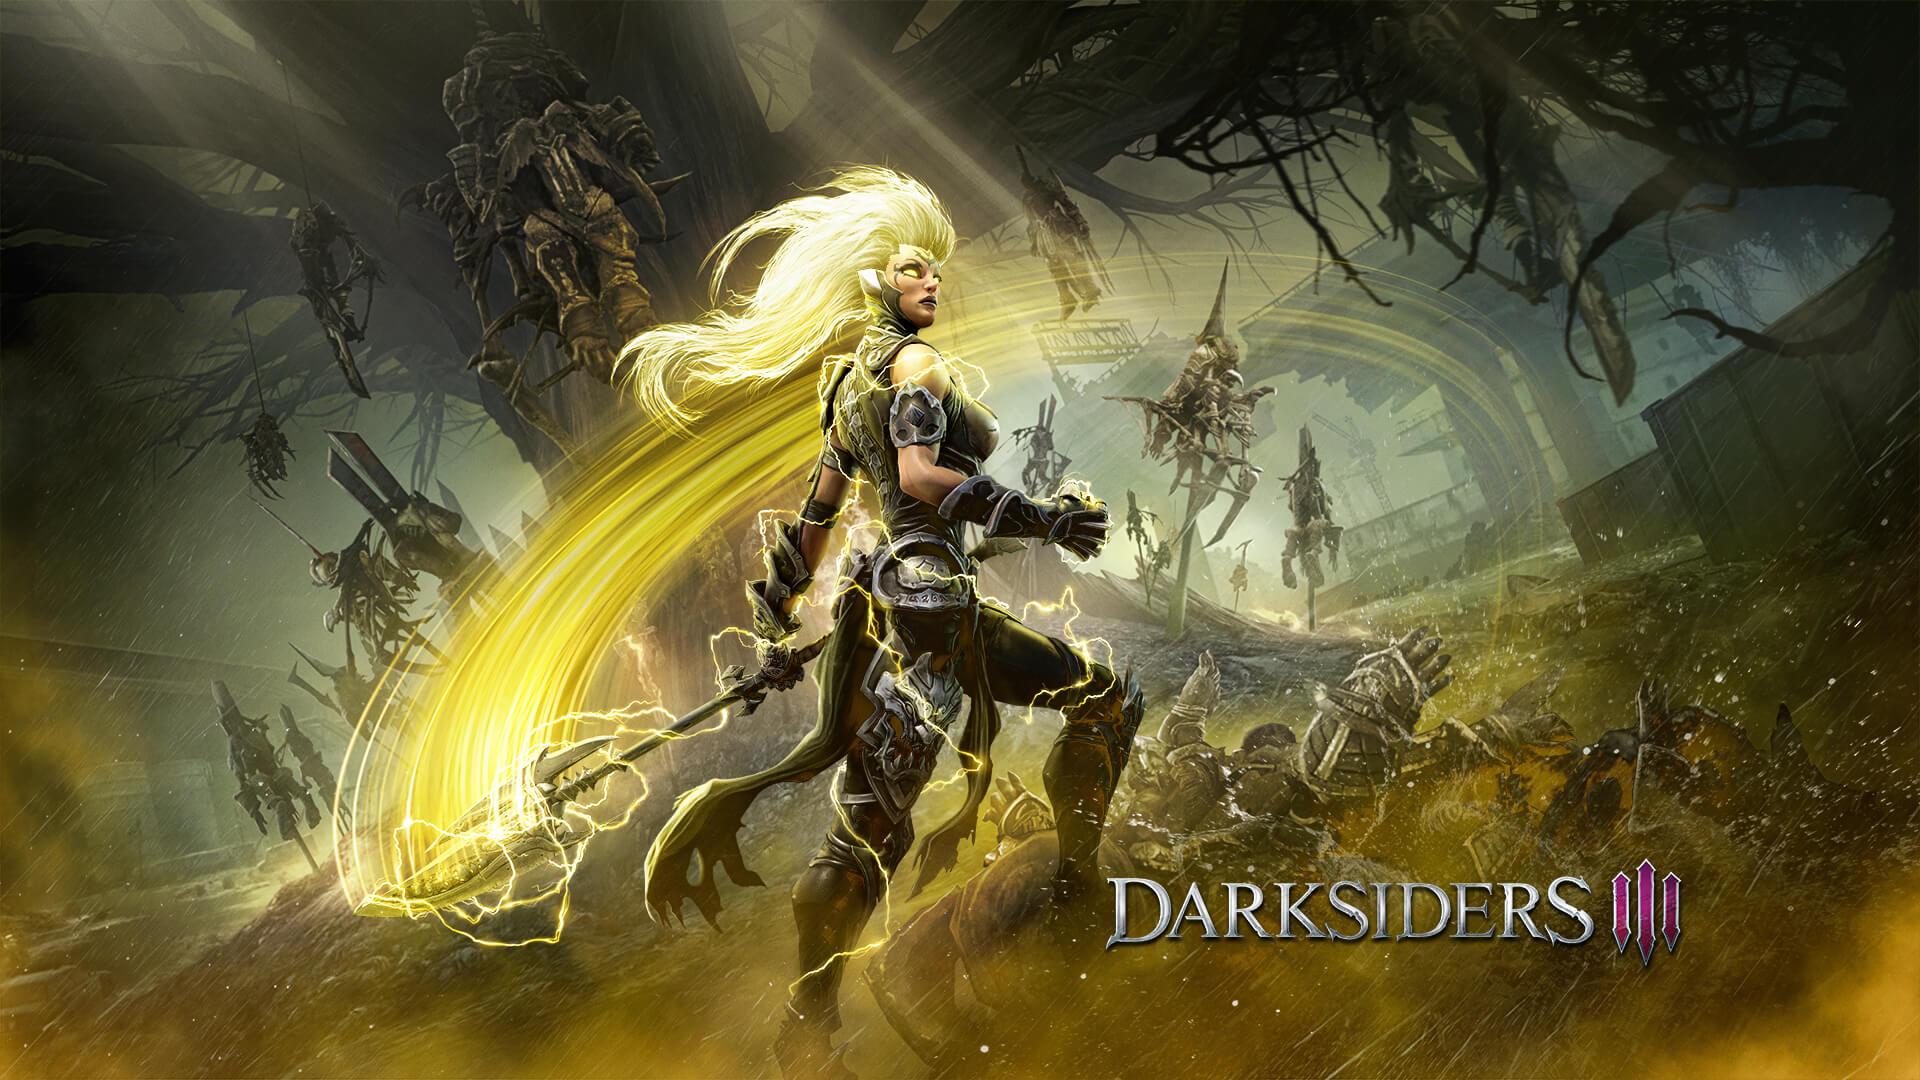 Media darksiders iii - Darksiders 3 wallpaper ...